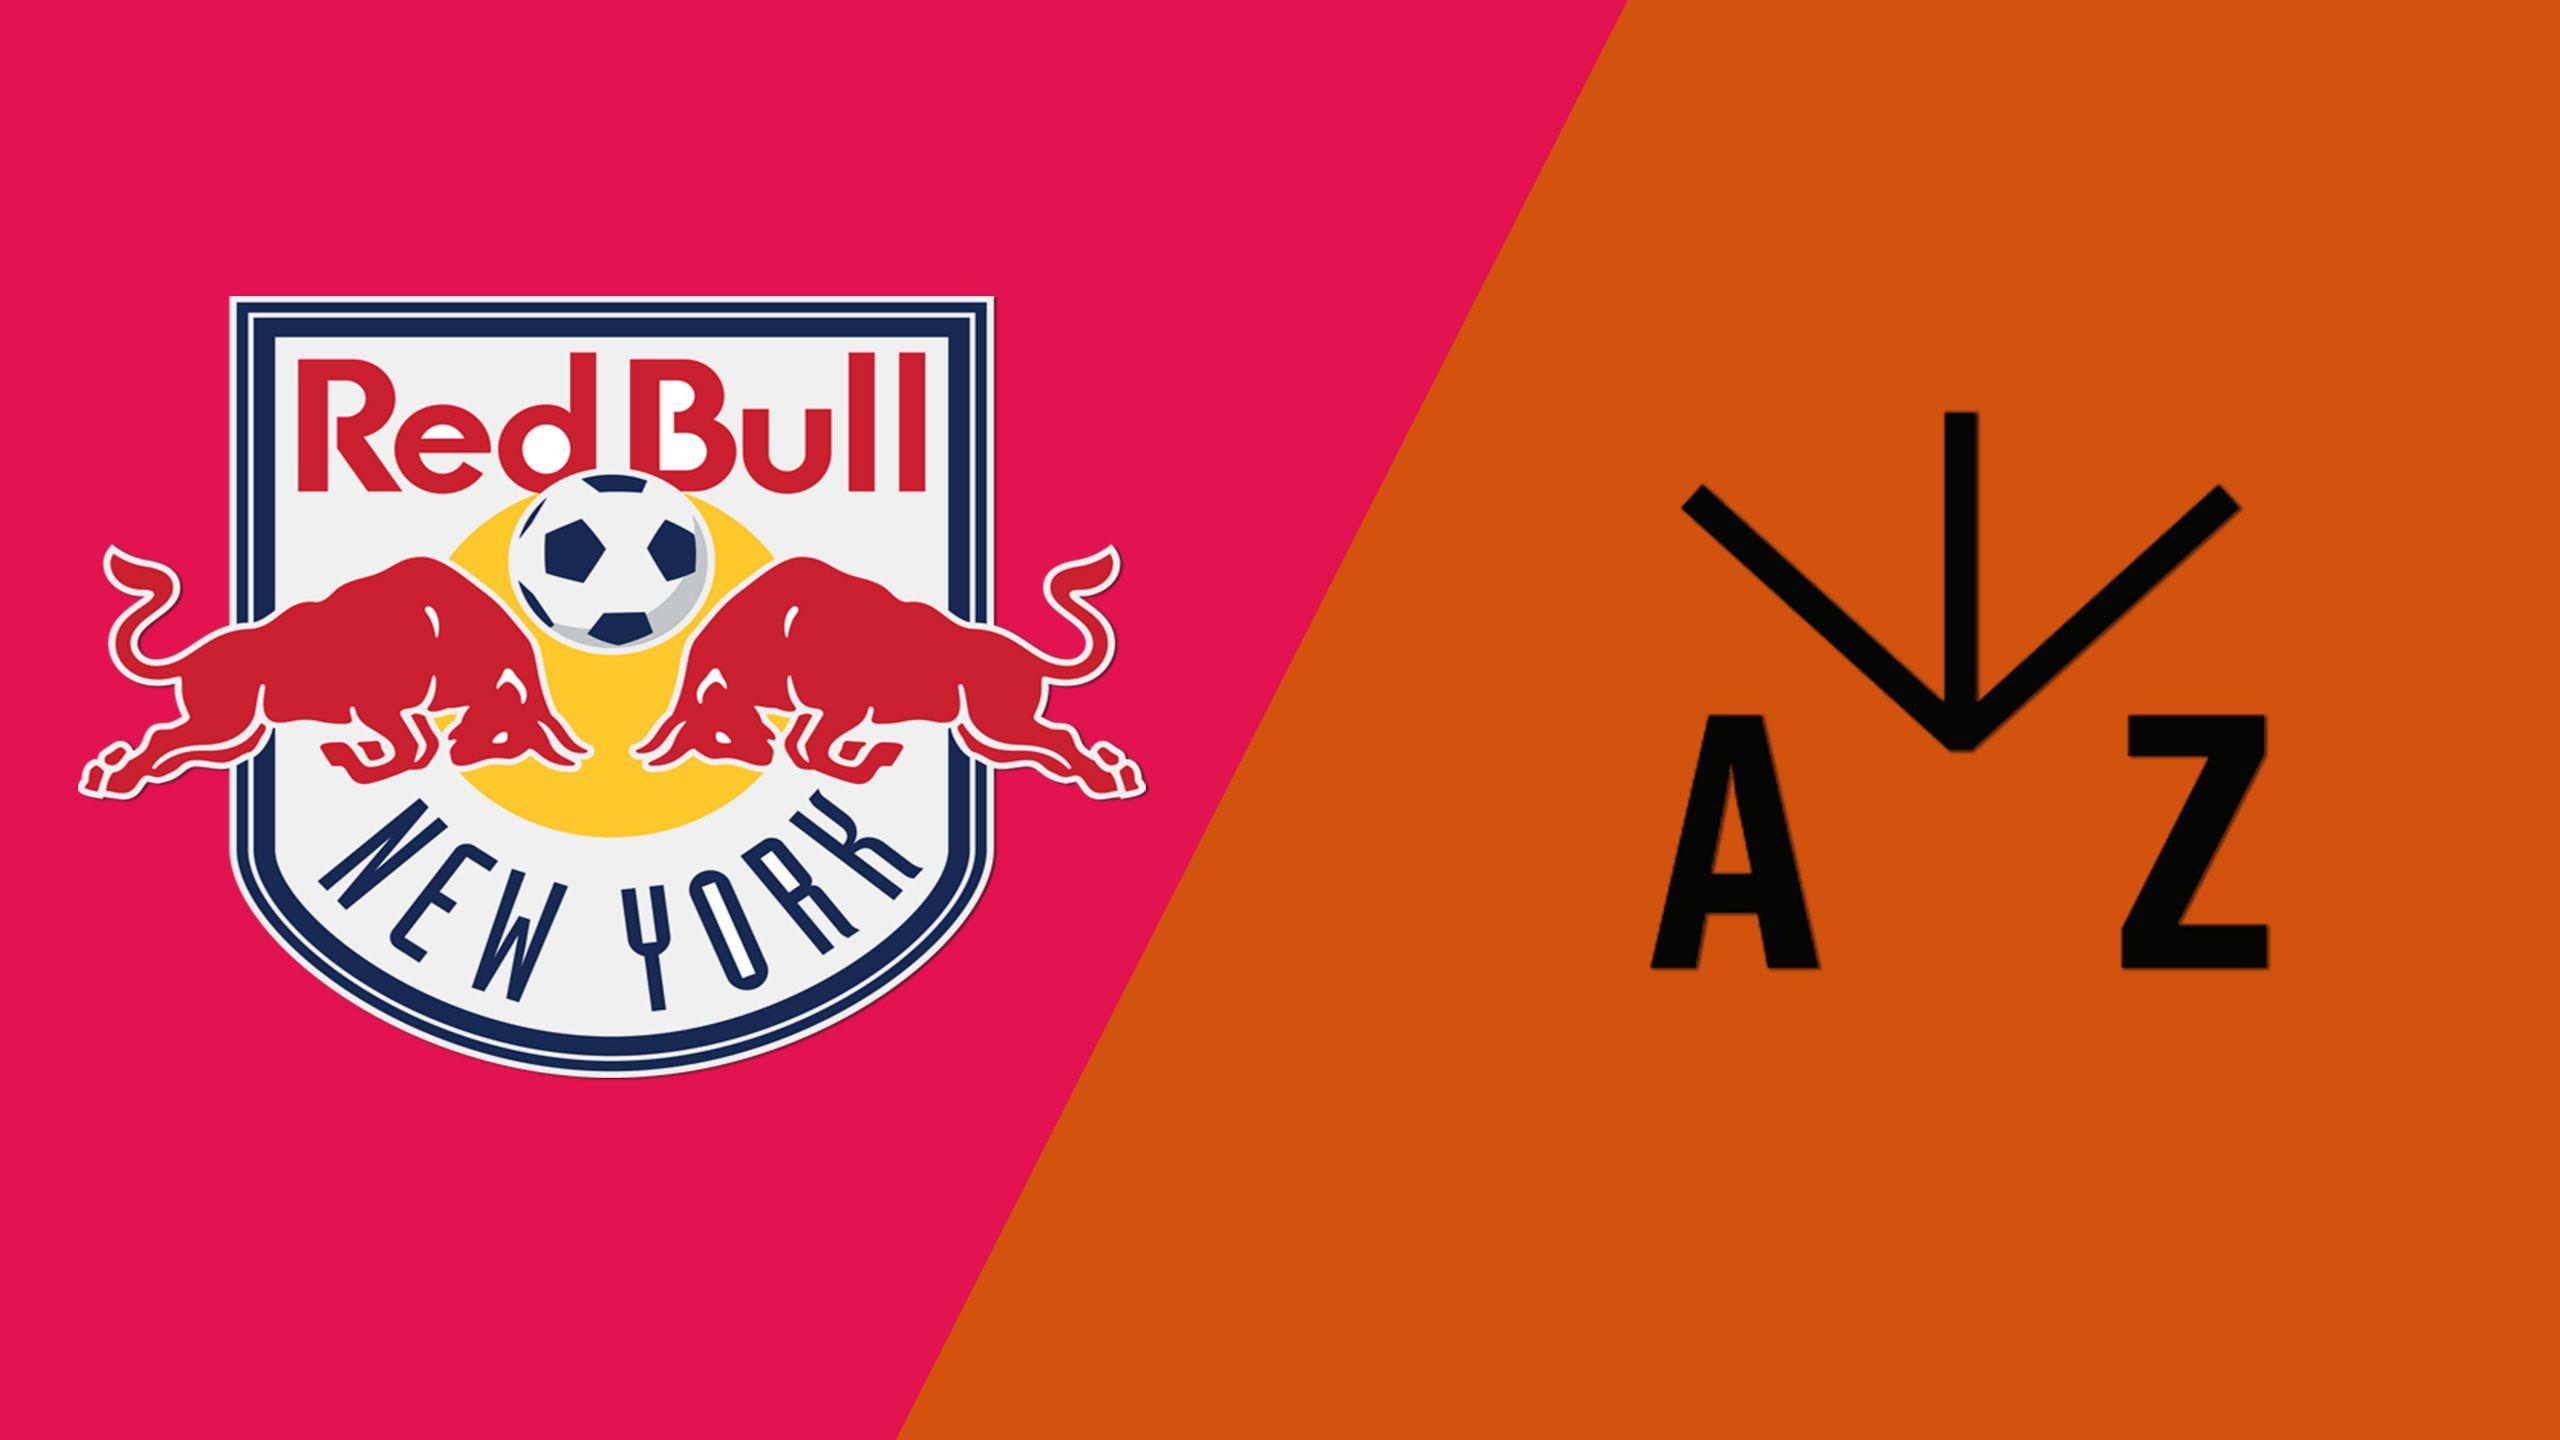 New York Red Bulls Under-14 vs. ICC All-Stars Arizona Under-14 (Quarterfinal) (International Champions Cup Futures)